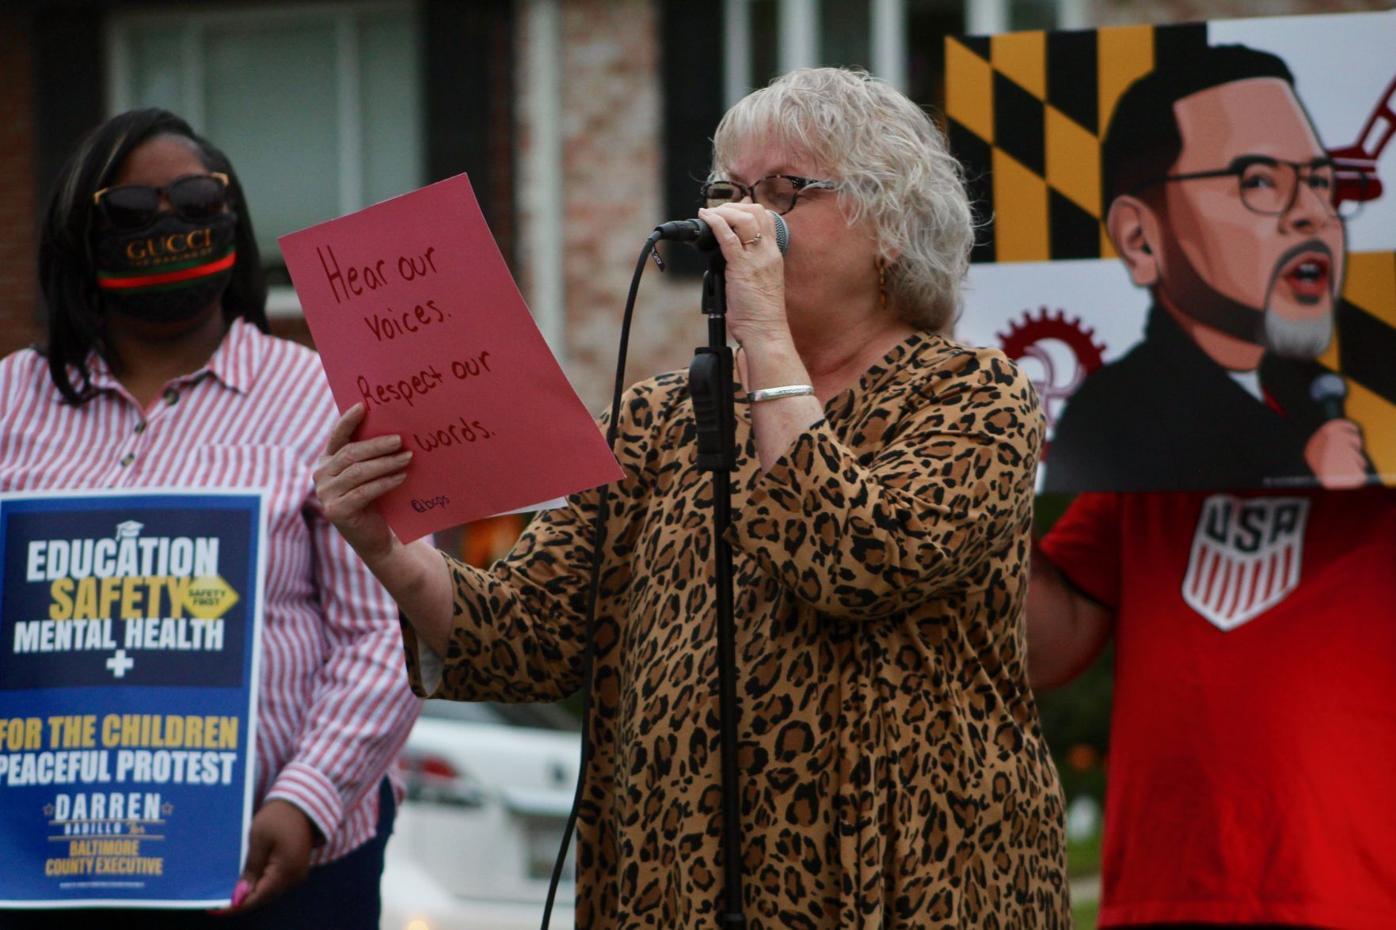 Locals, politicians protest school violence